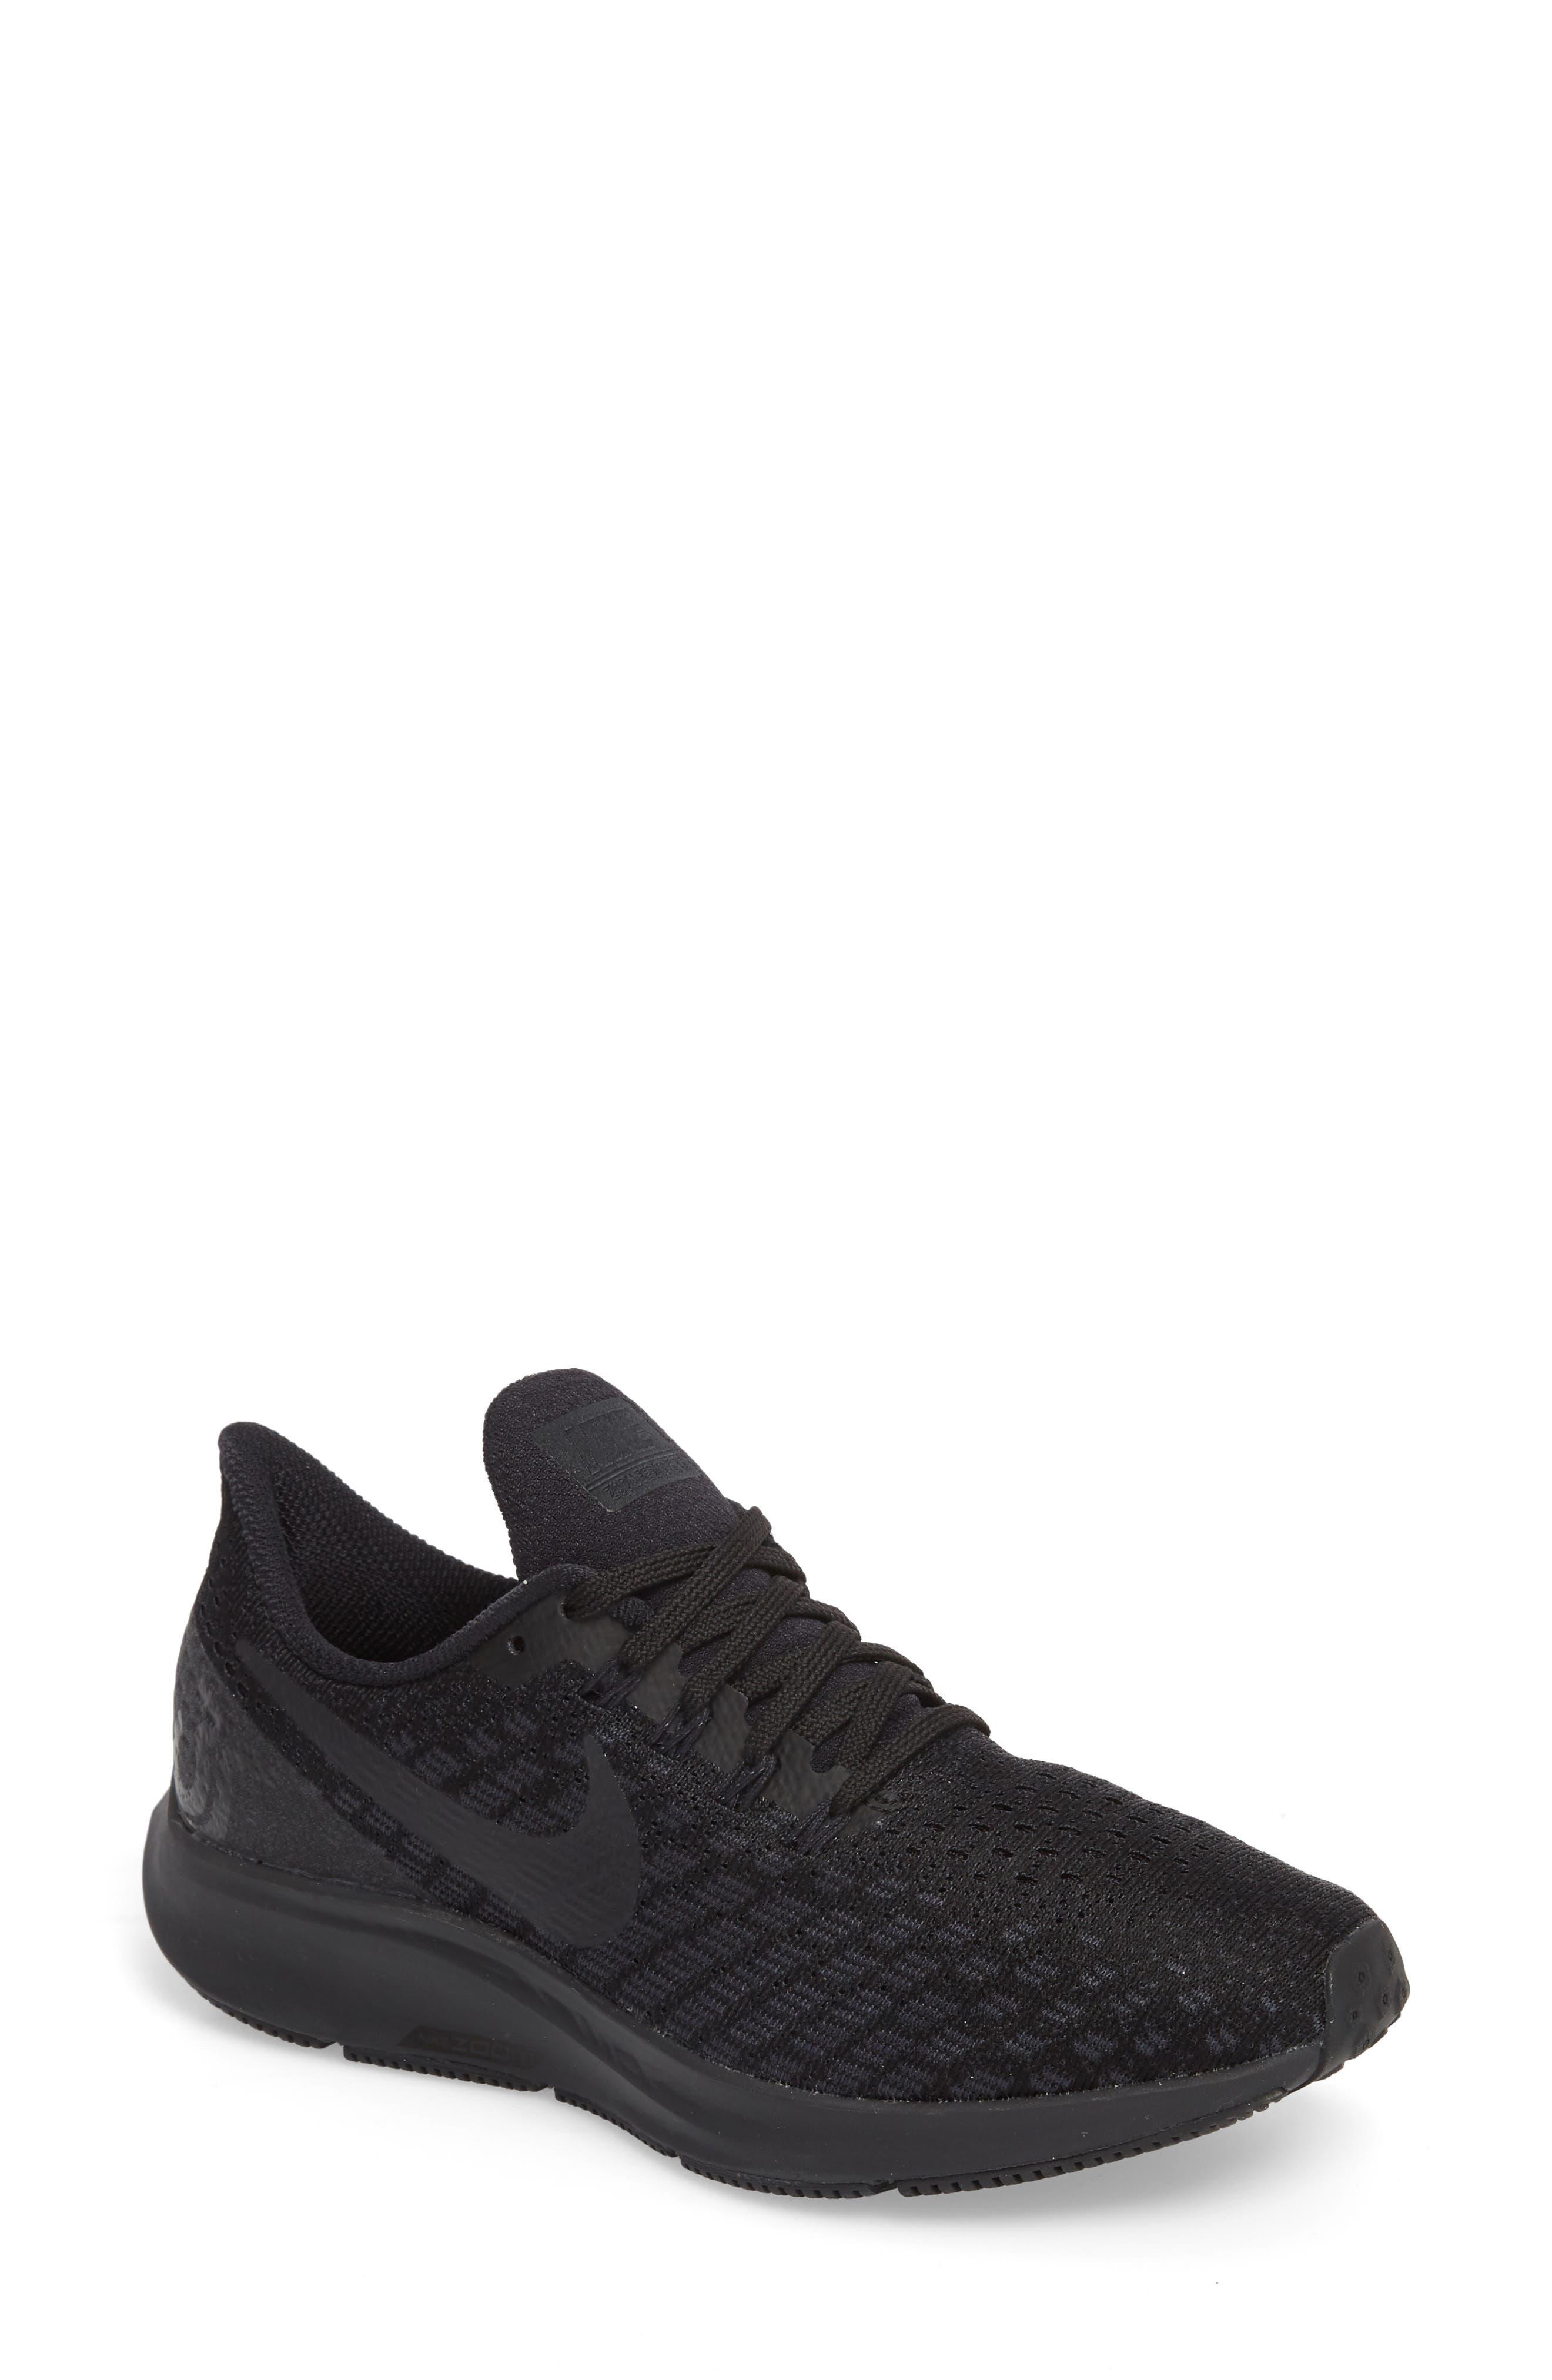 buy popular 94c6f a6625 New Markdowns Women s Nike   Nordstrom